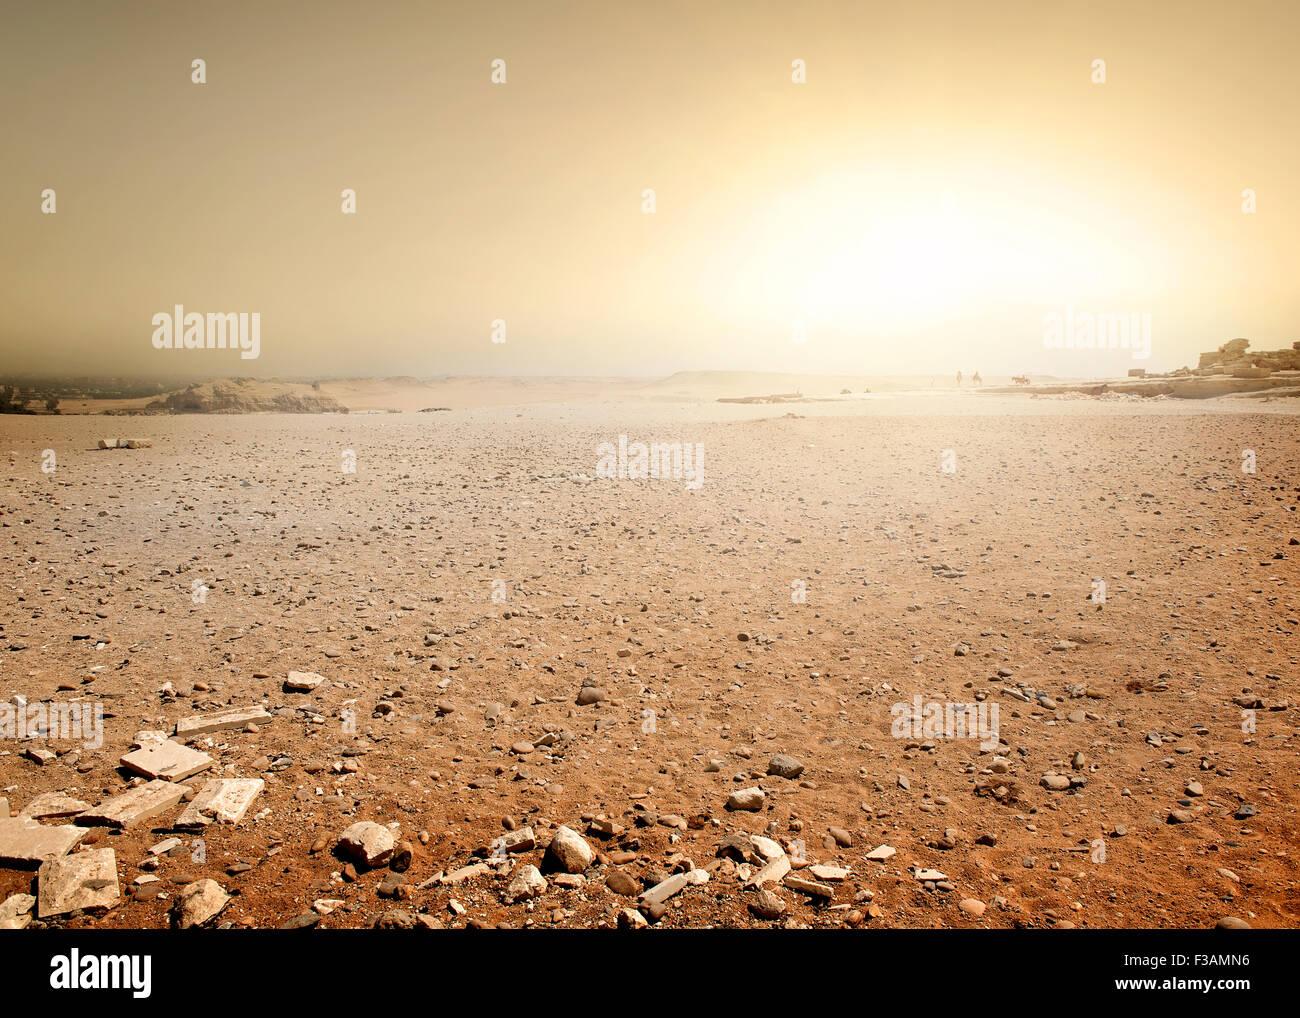 Desierto de Arena en Egipto al atardecer Imagen De Stock